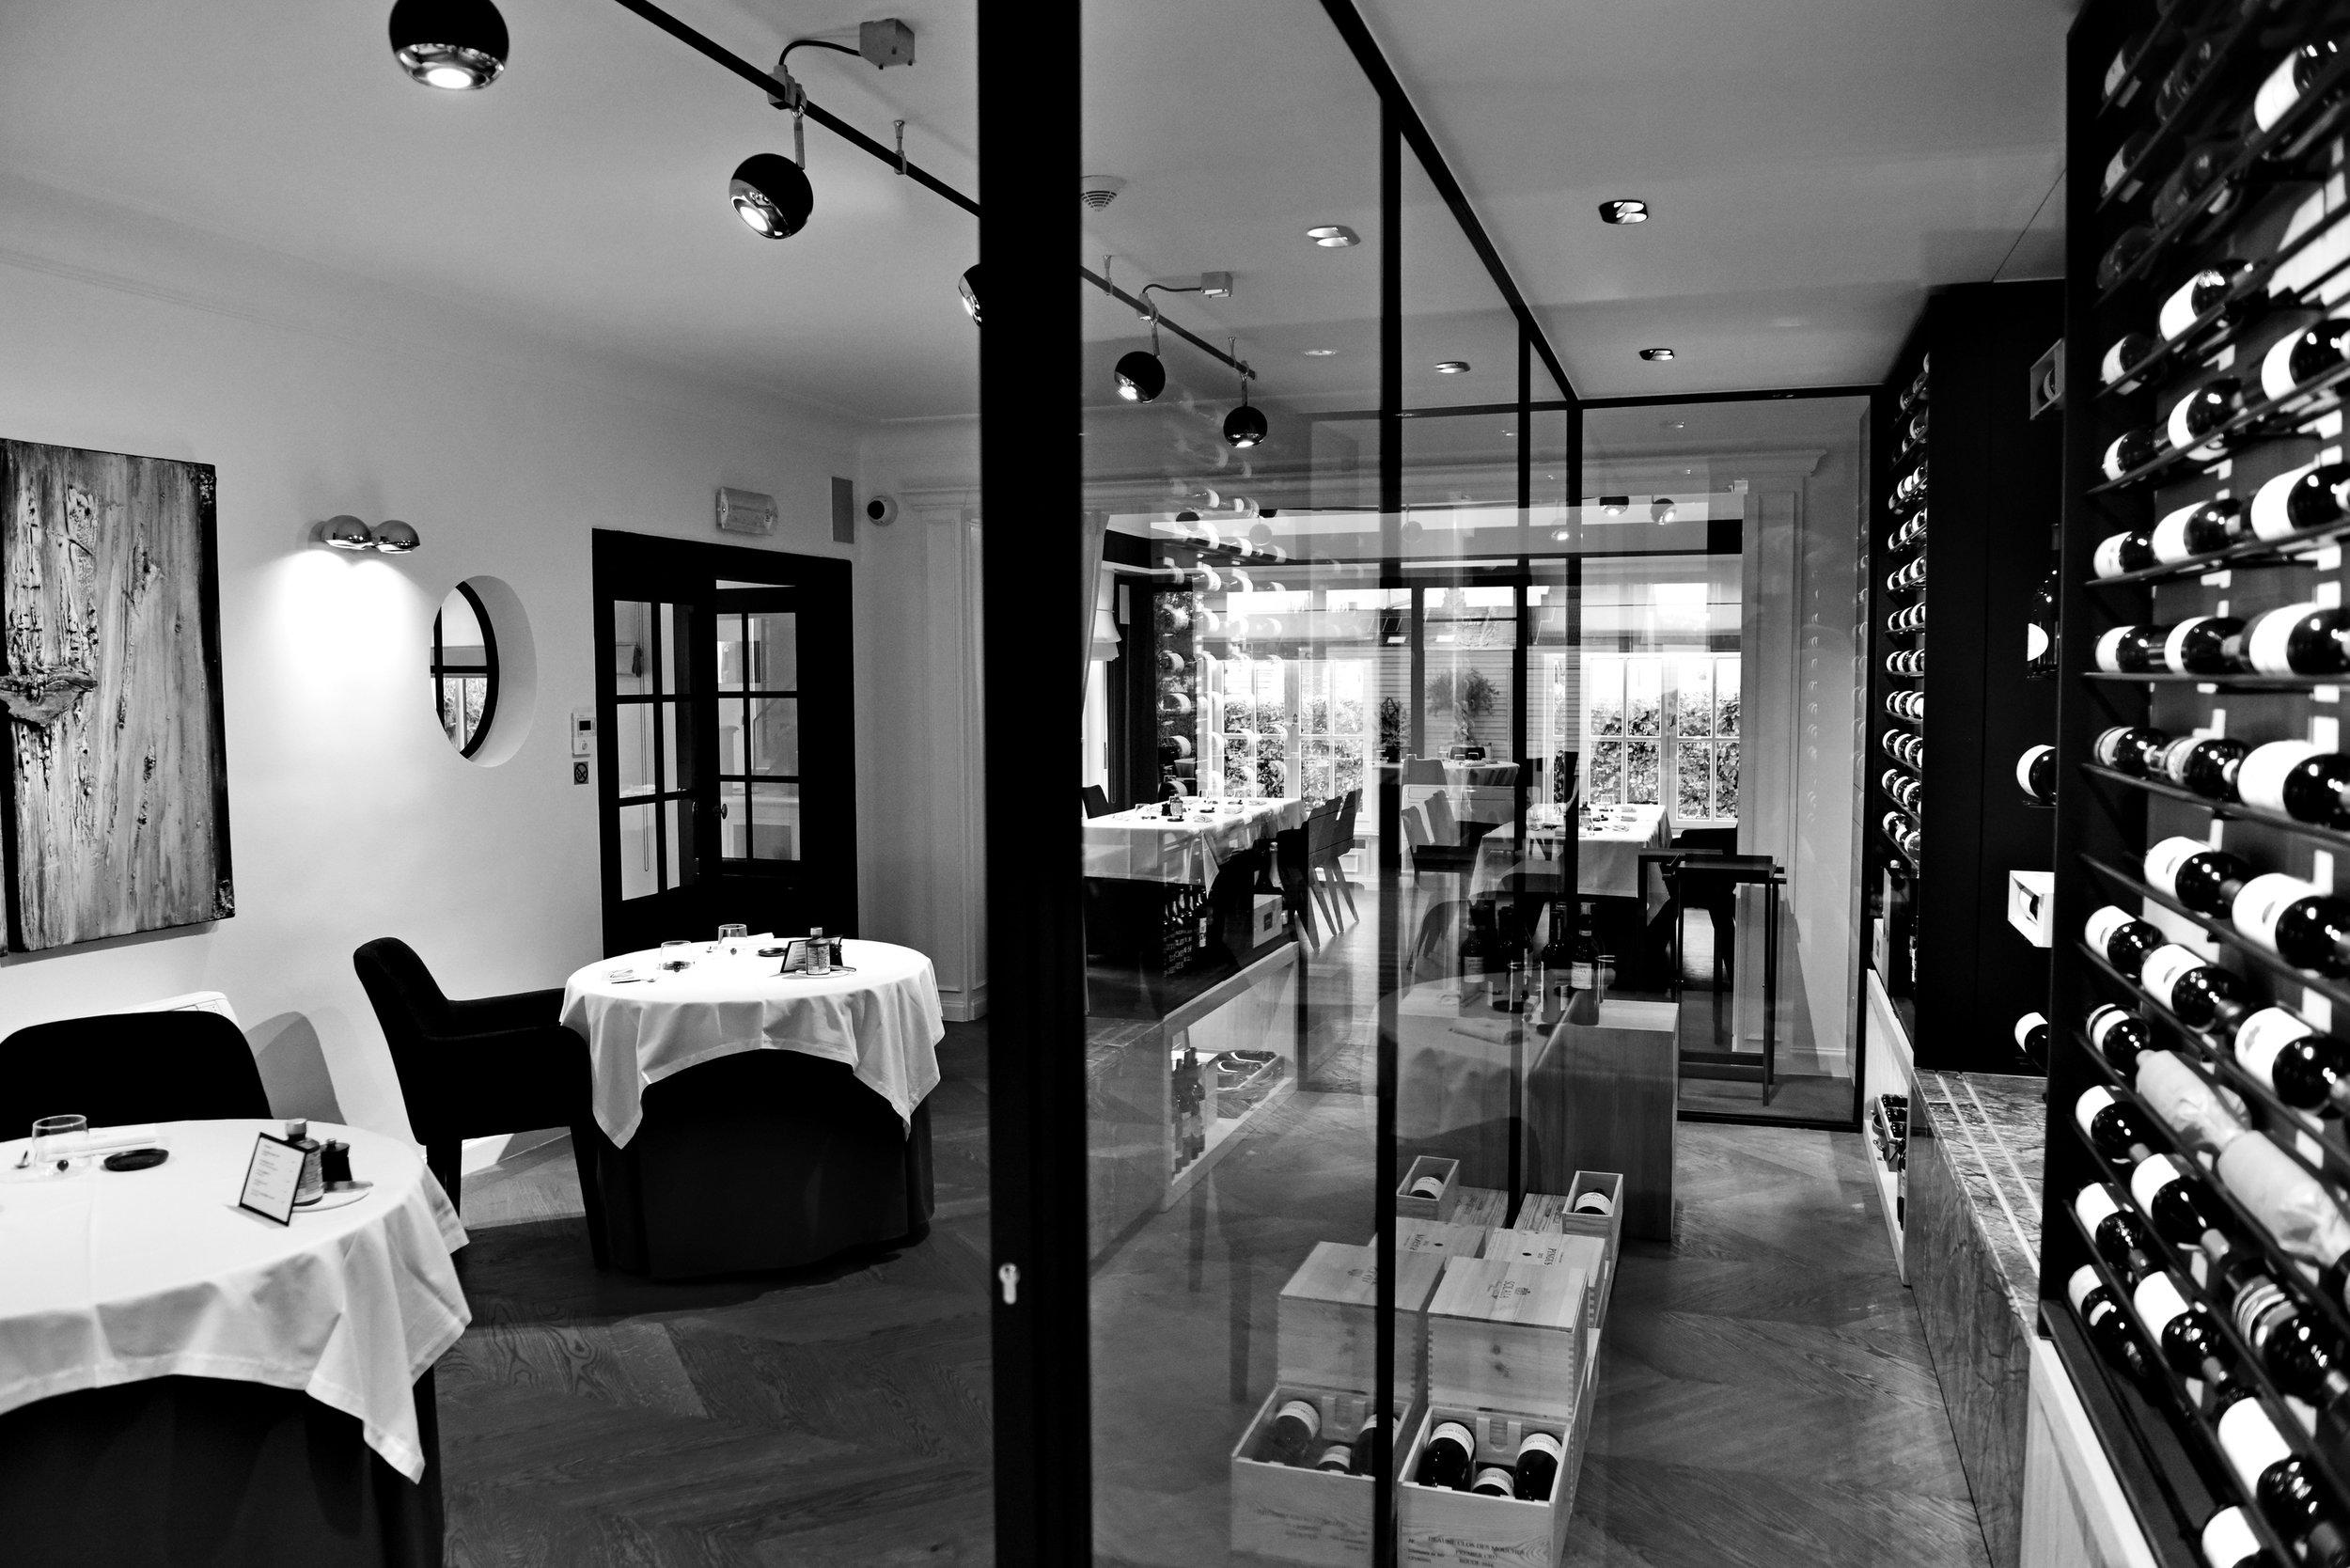 30 restaurant de bakermat ninove tablefever bart albrecht culinair fotograaf.jpg